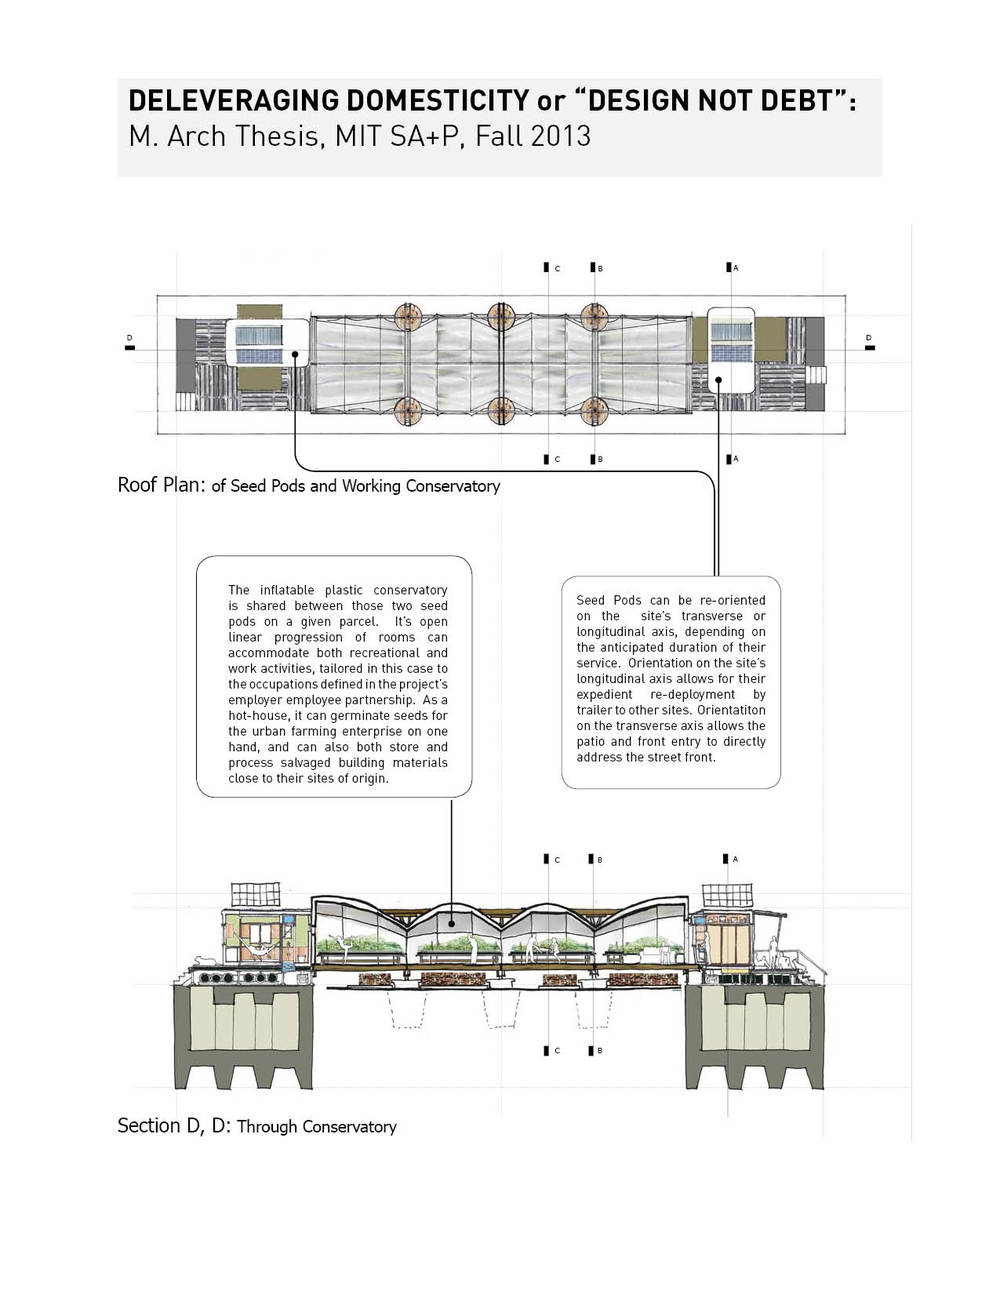 MIT_thesis7.jpg